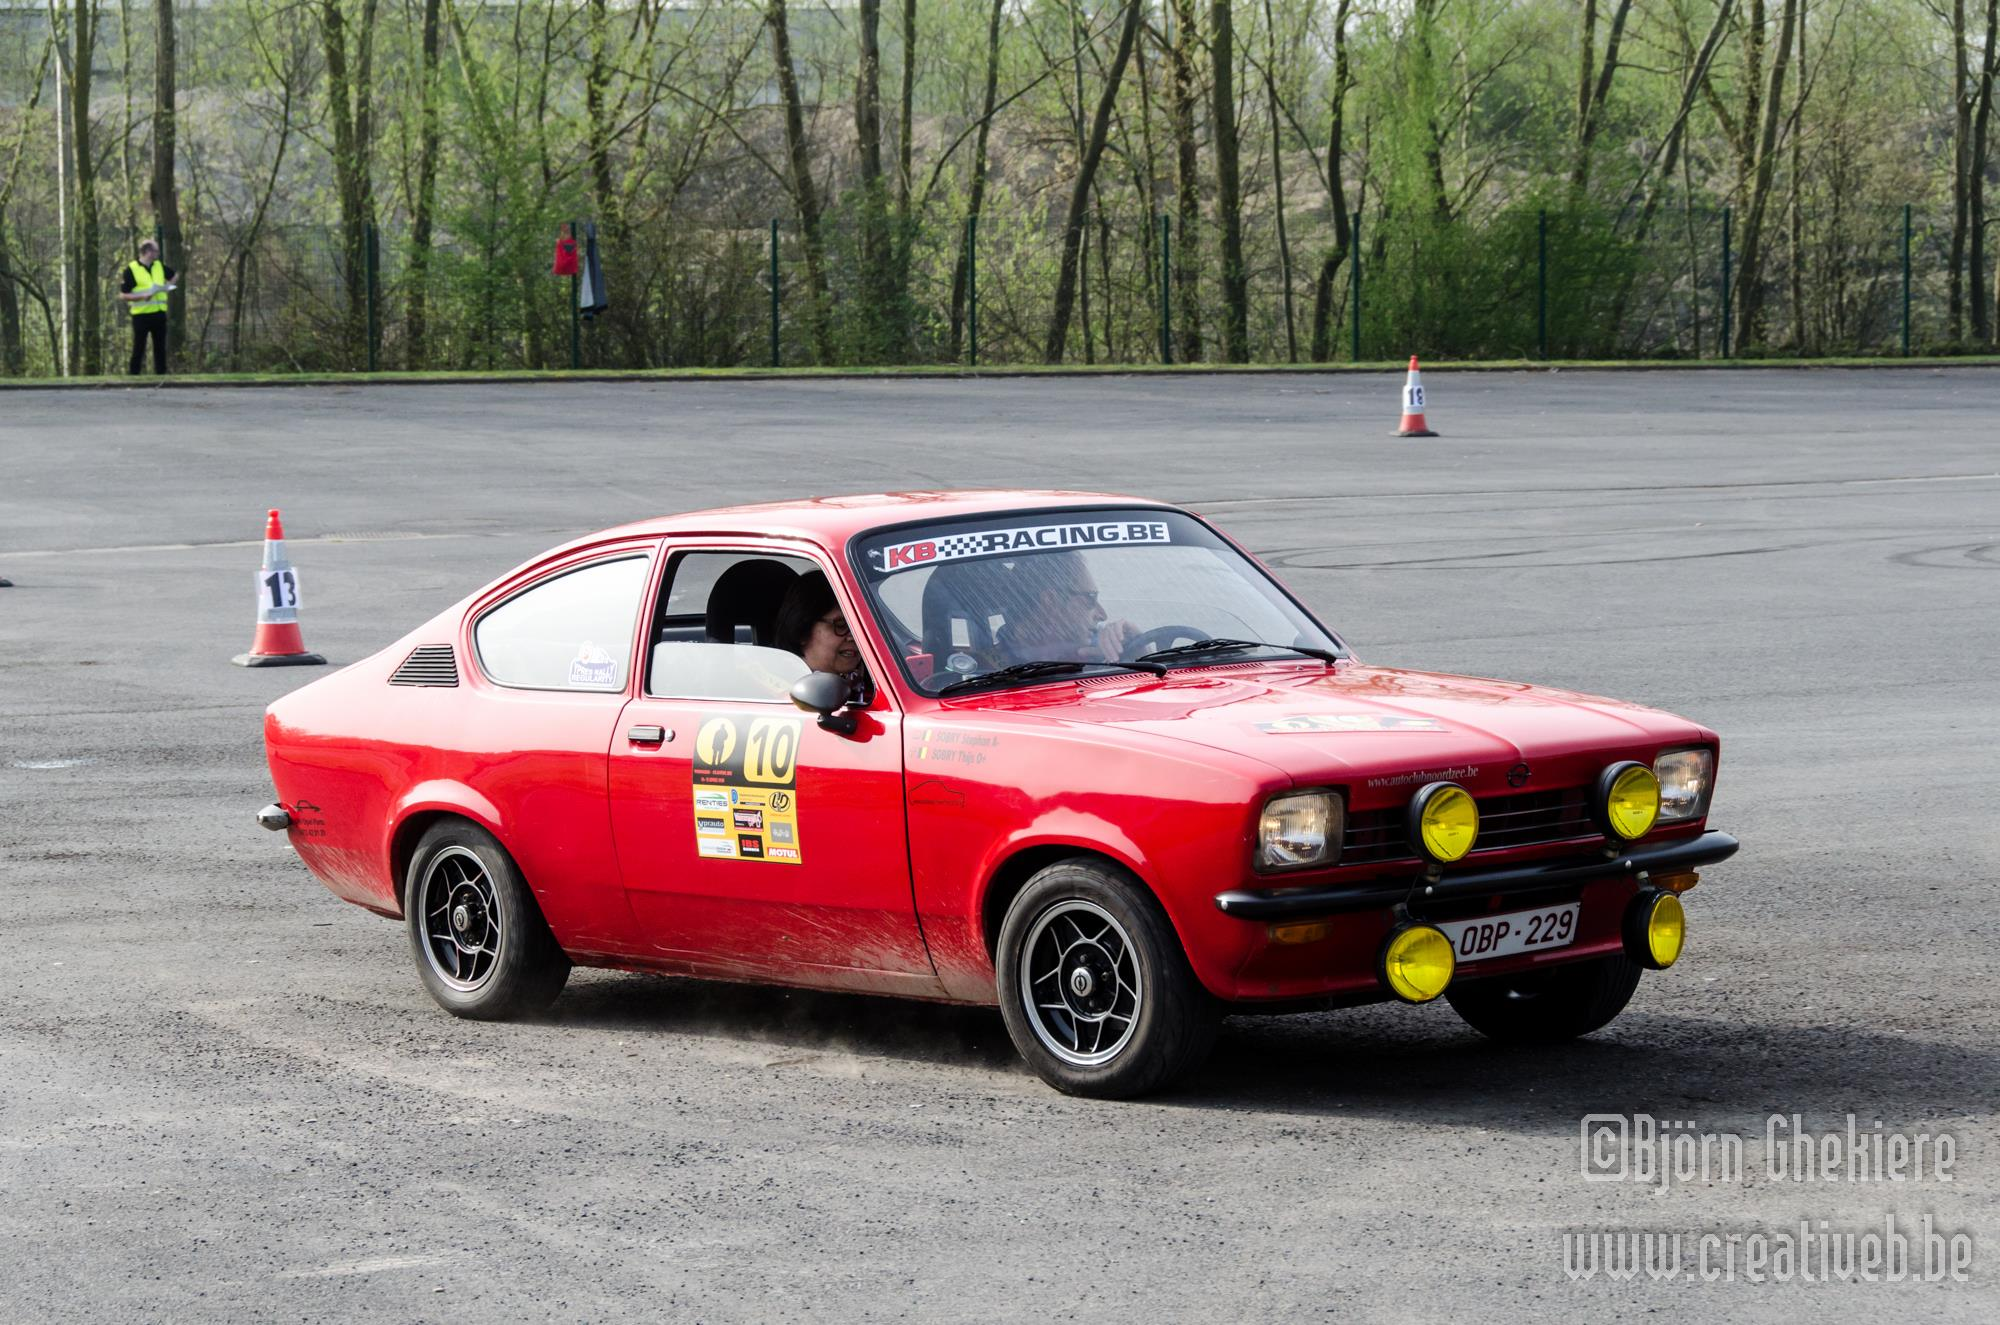 1012 - Opel - Kadett C - 1977